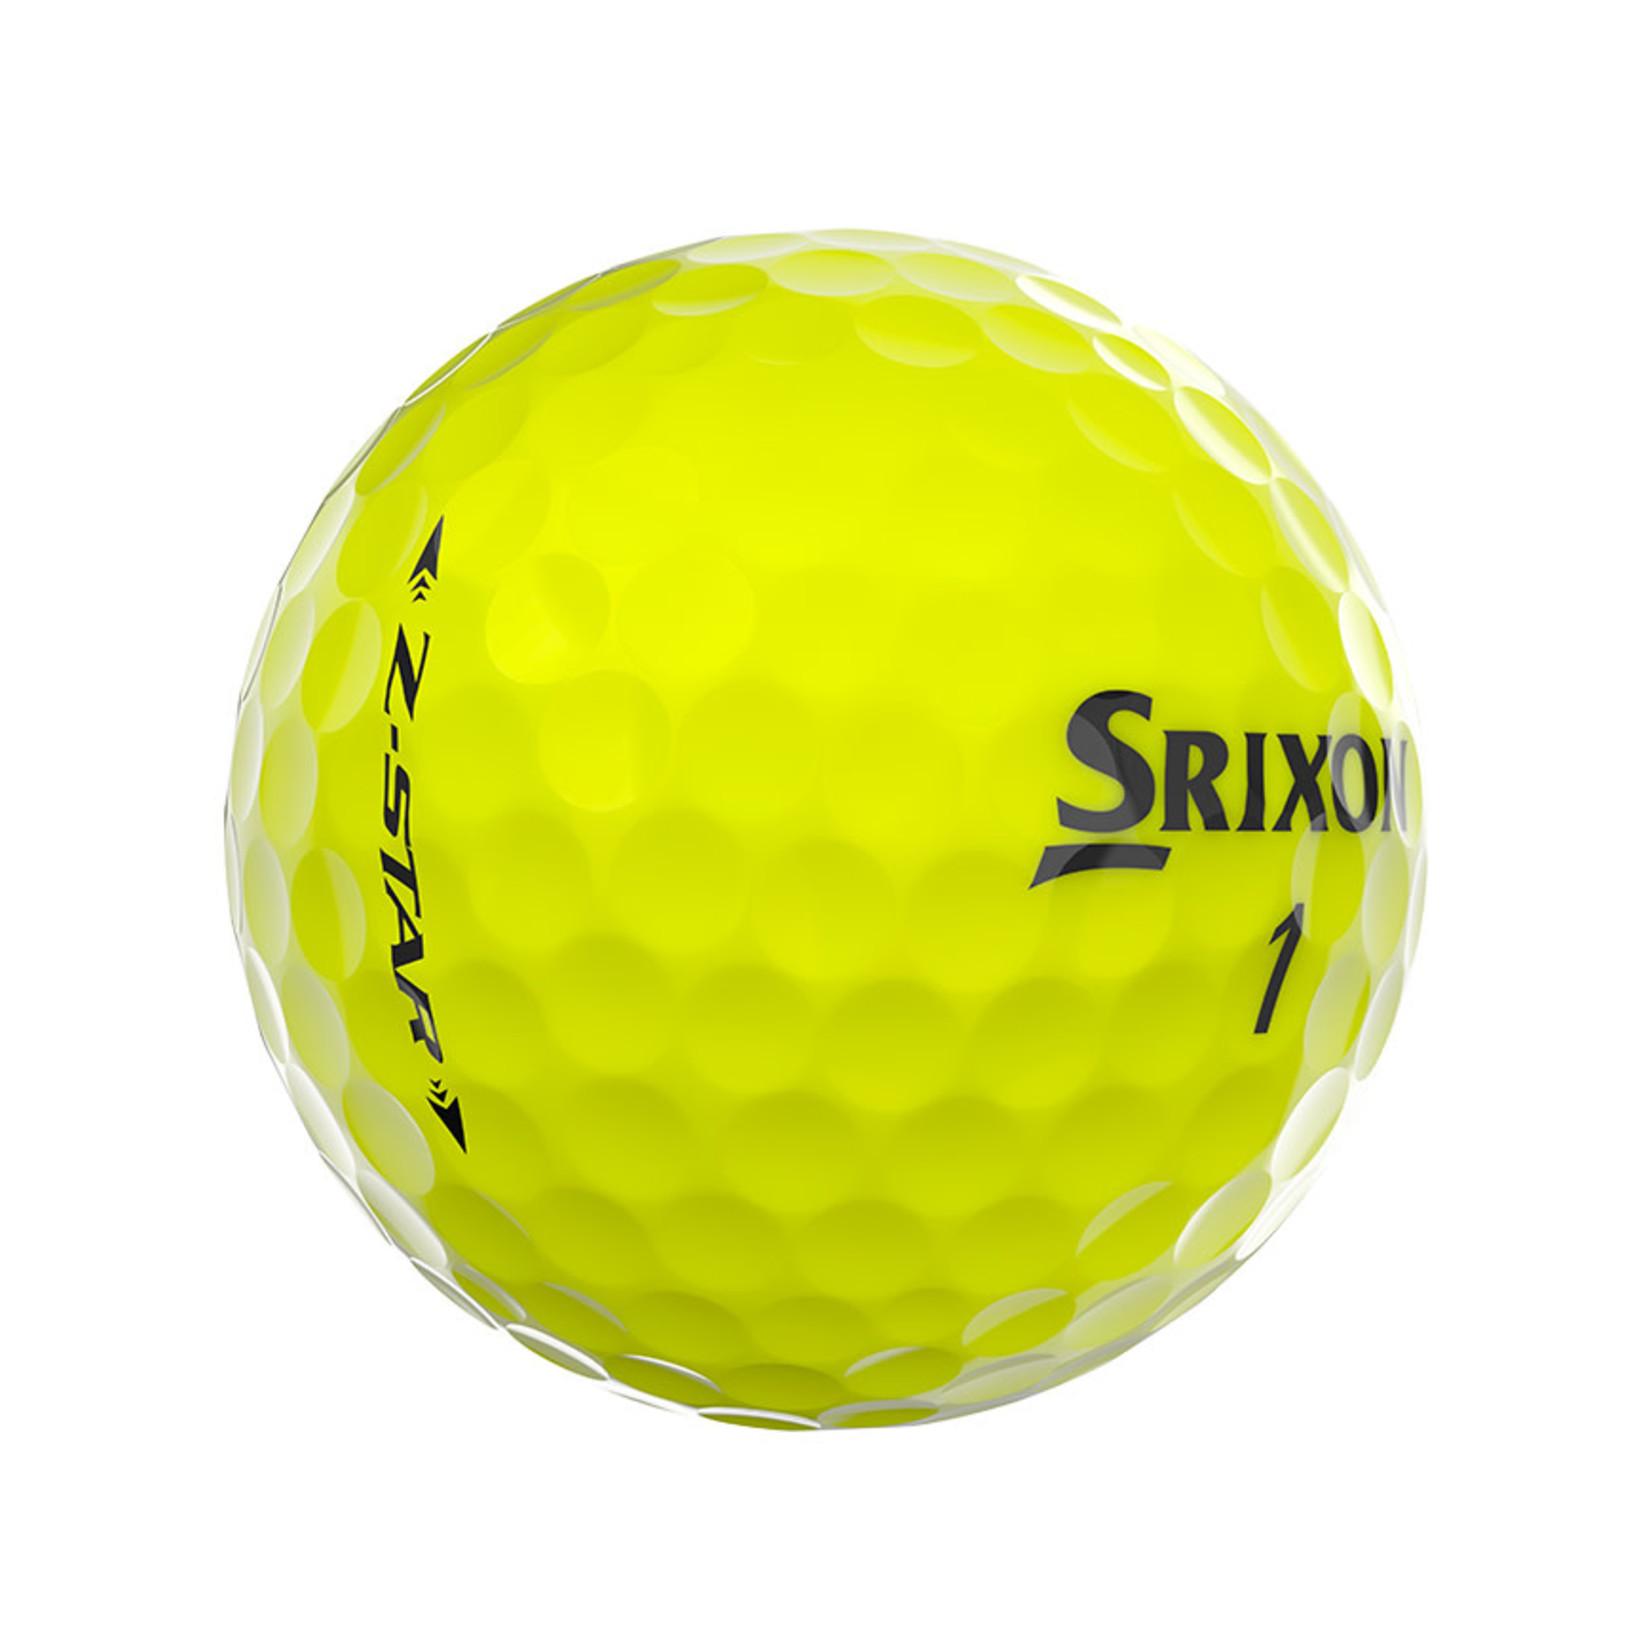 Srixon Srixon Zstar Yellow